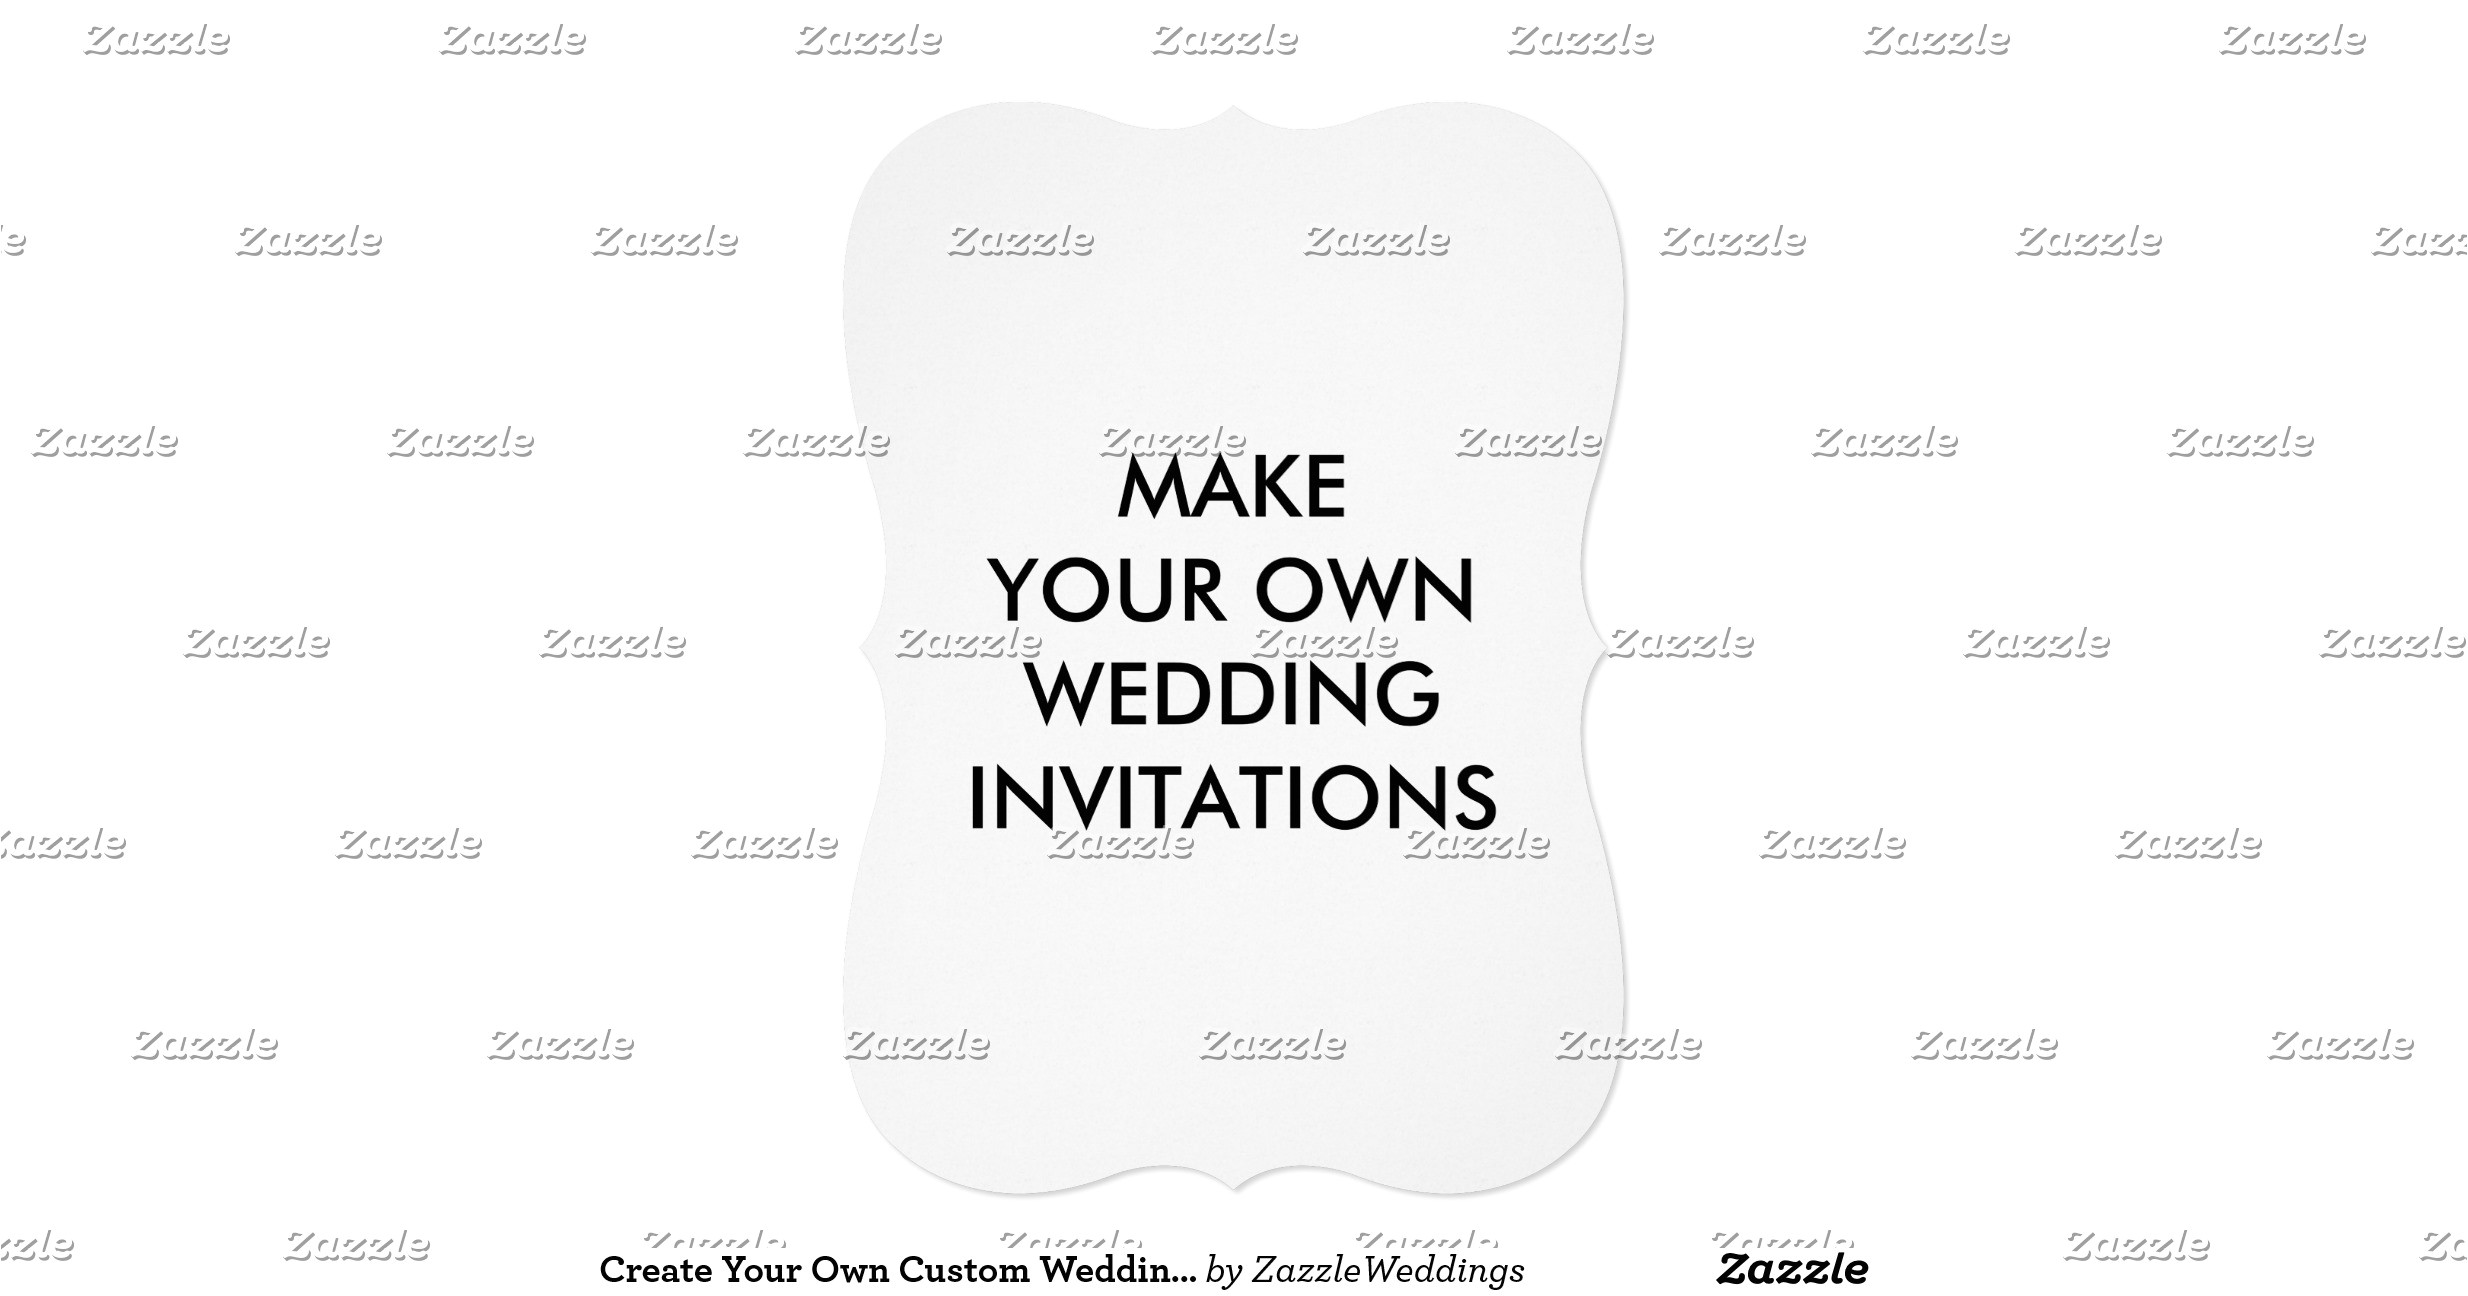 create your own custom wedding invitations 5 x 7 256206939328669080